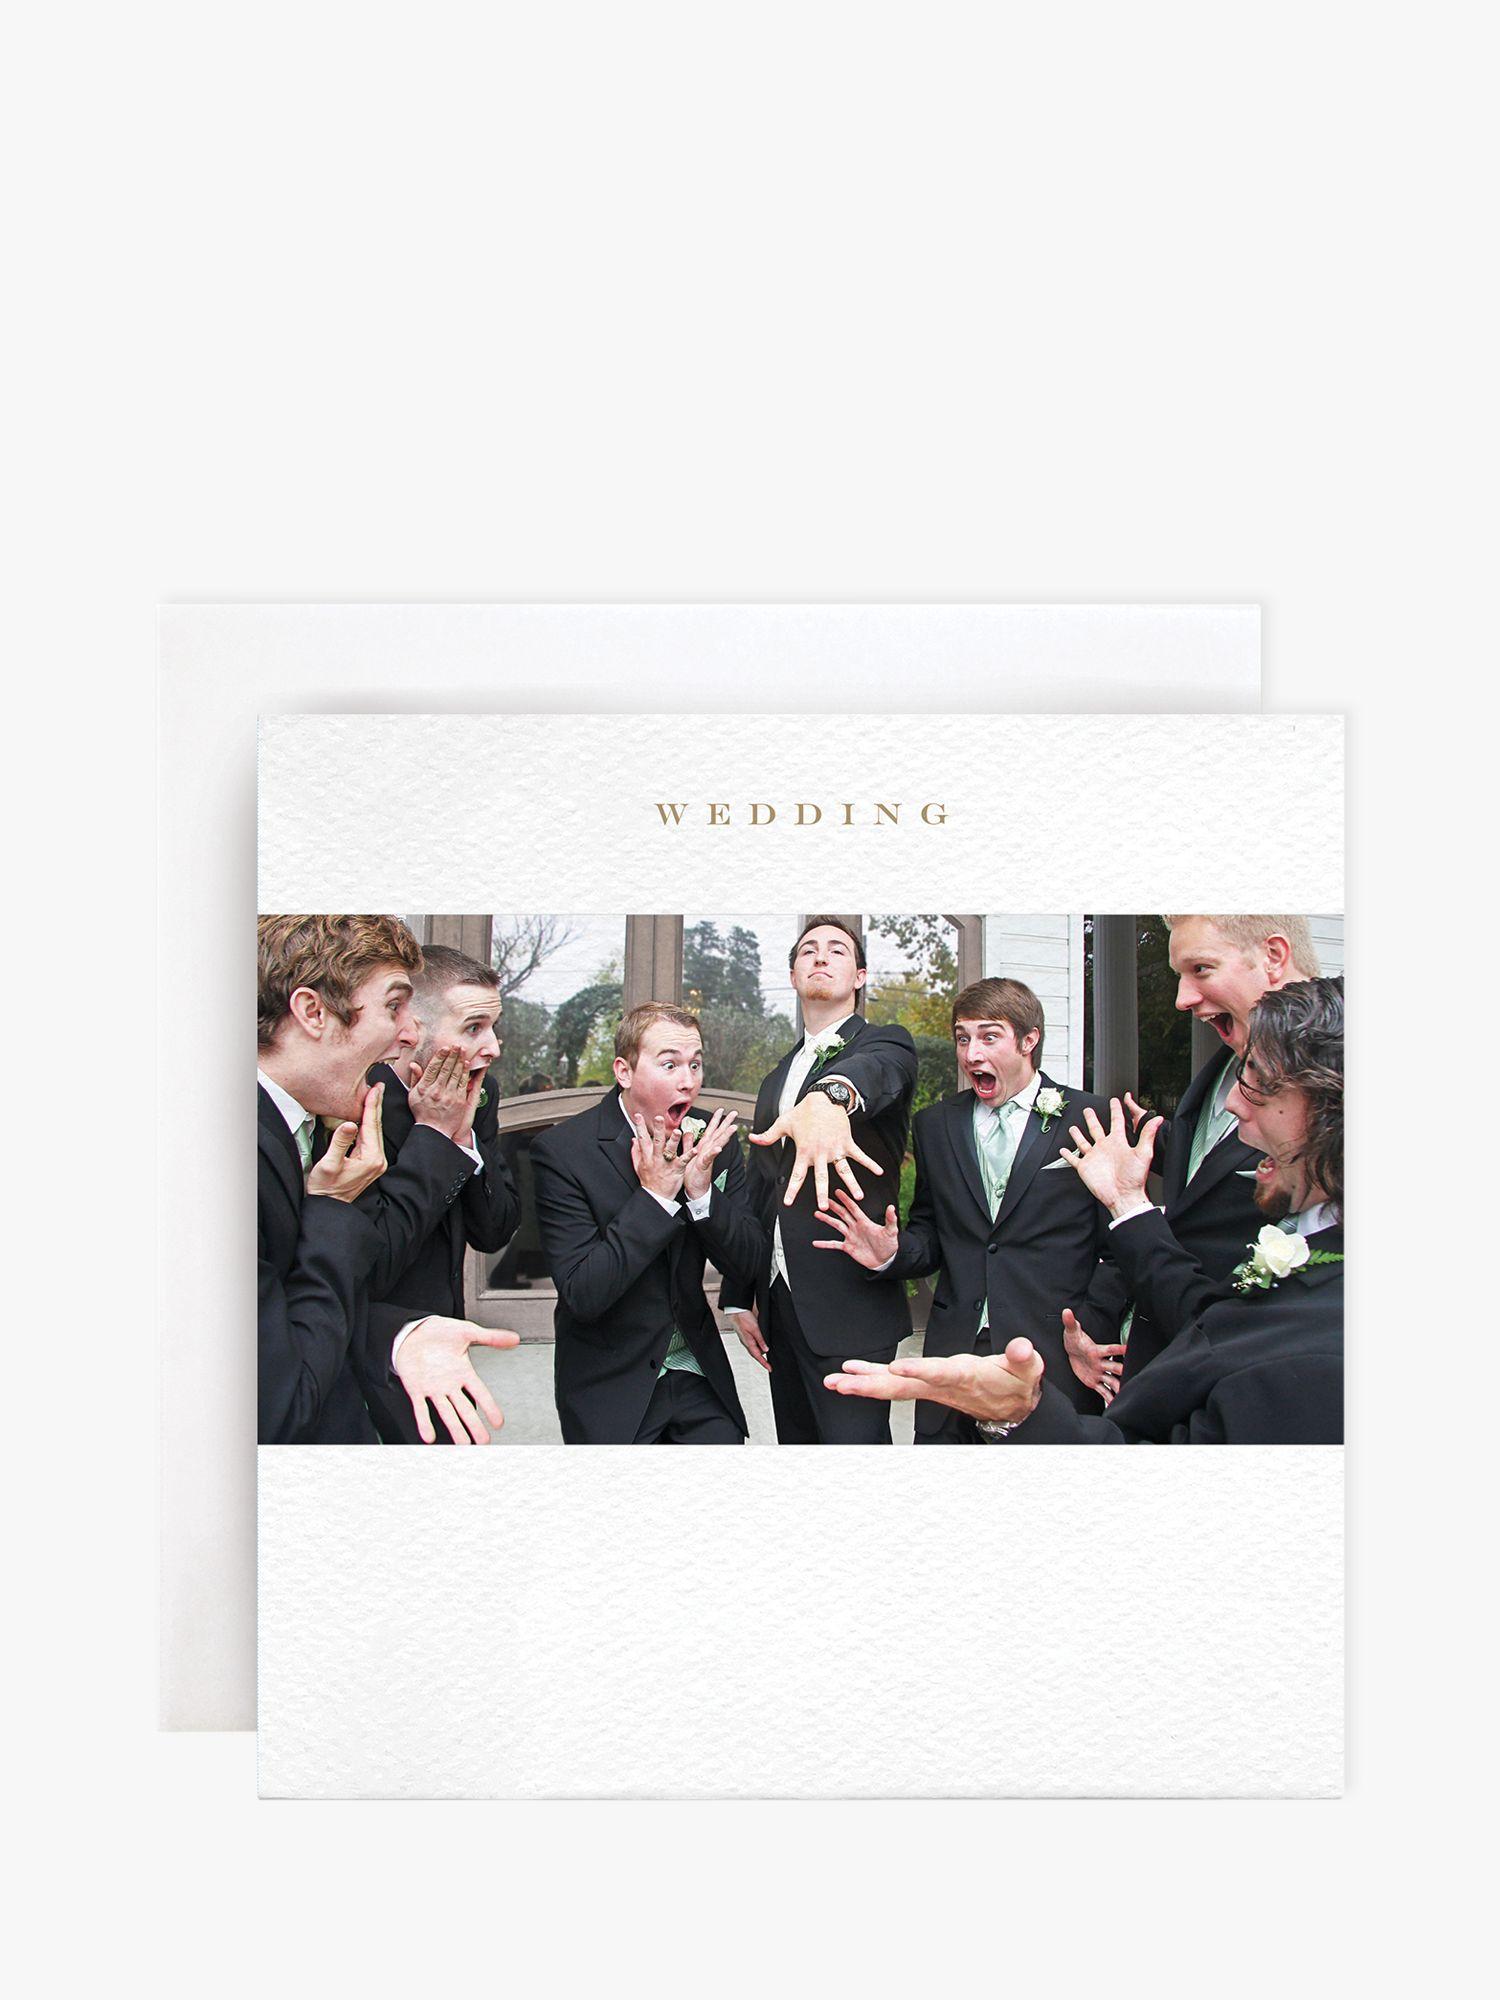 Susan O'Hanlon Susan O'Hanlon Groom Wedding Ring Wedding Card